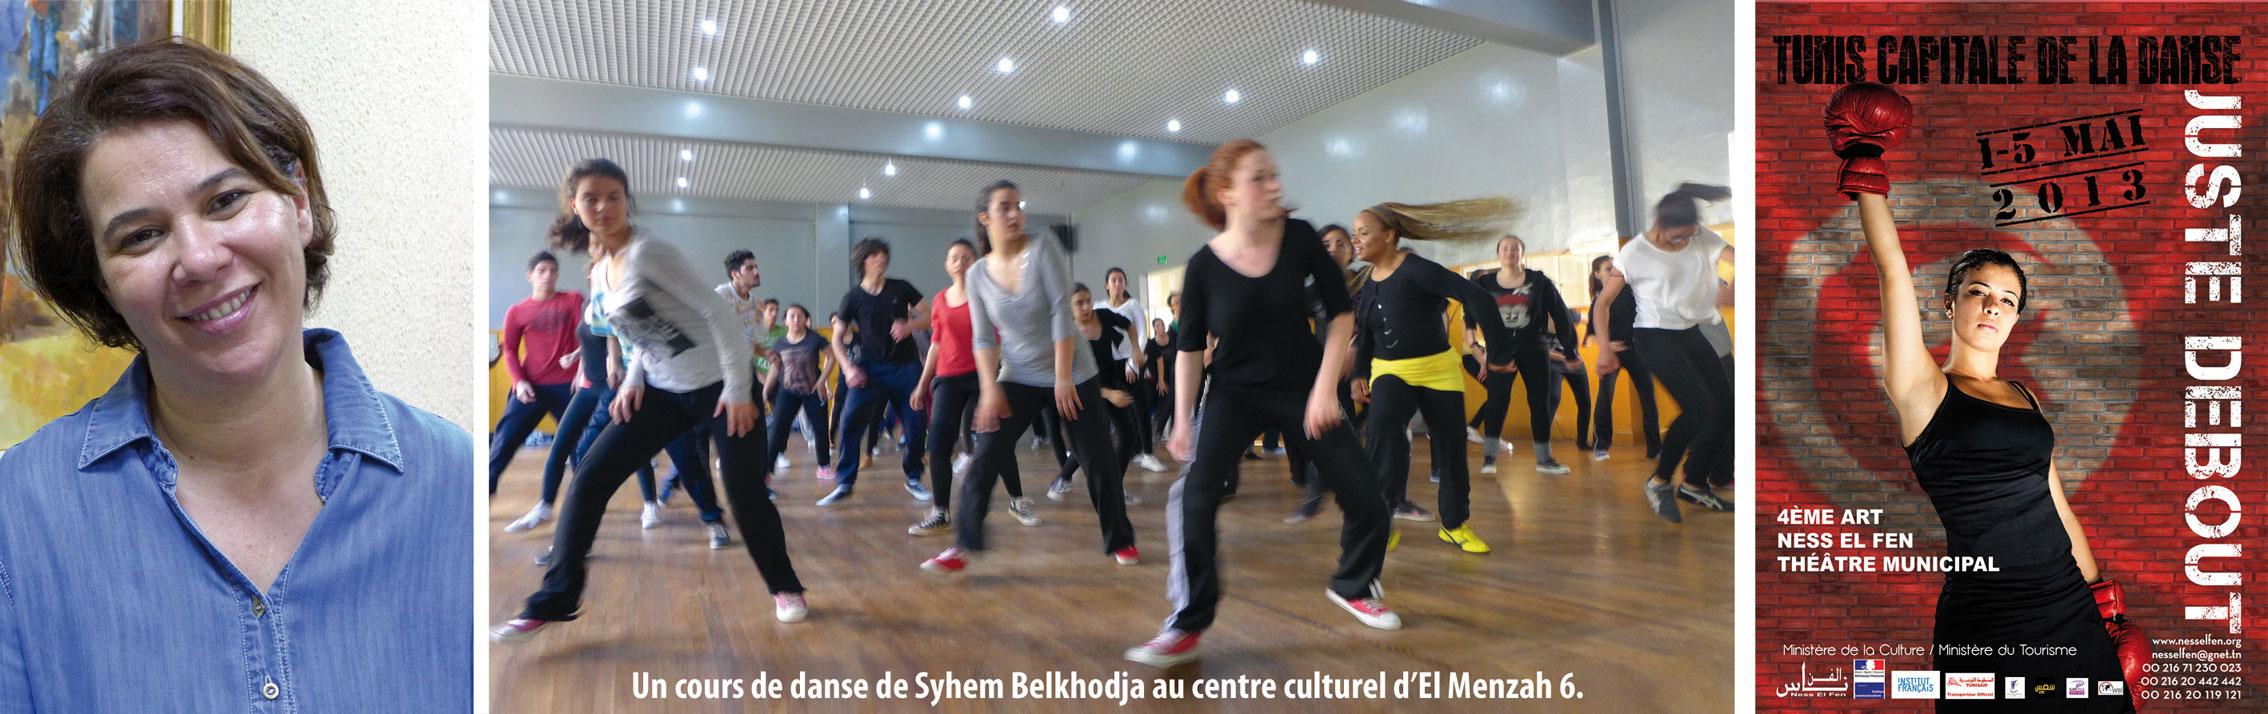 Syhem-Belkhodja-Danse